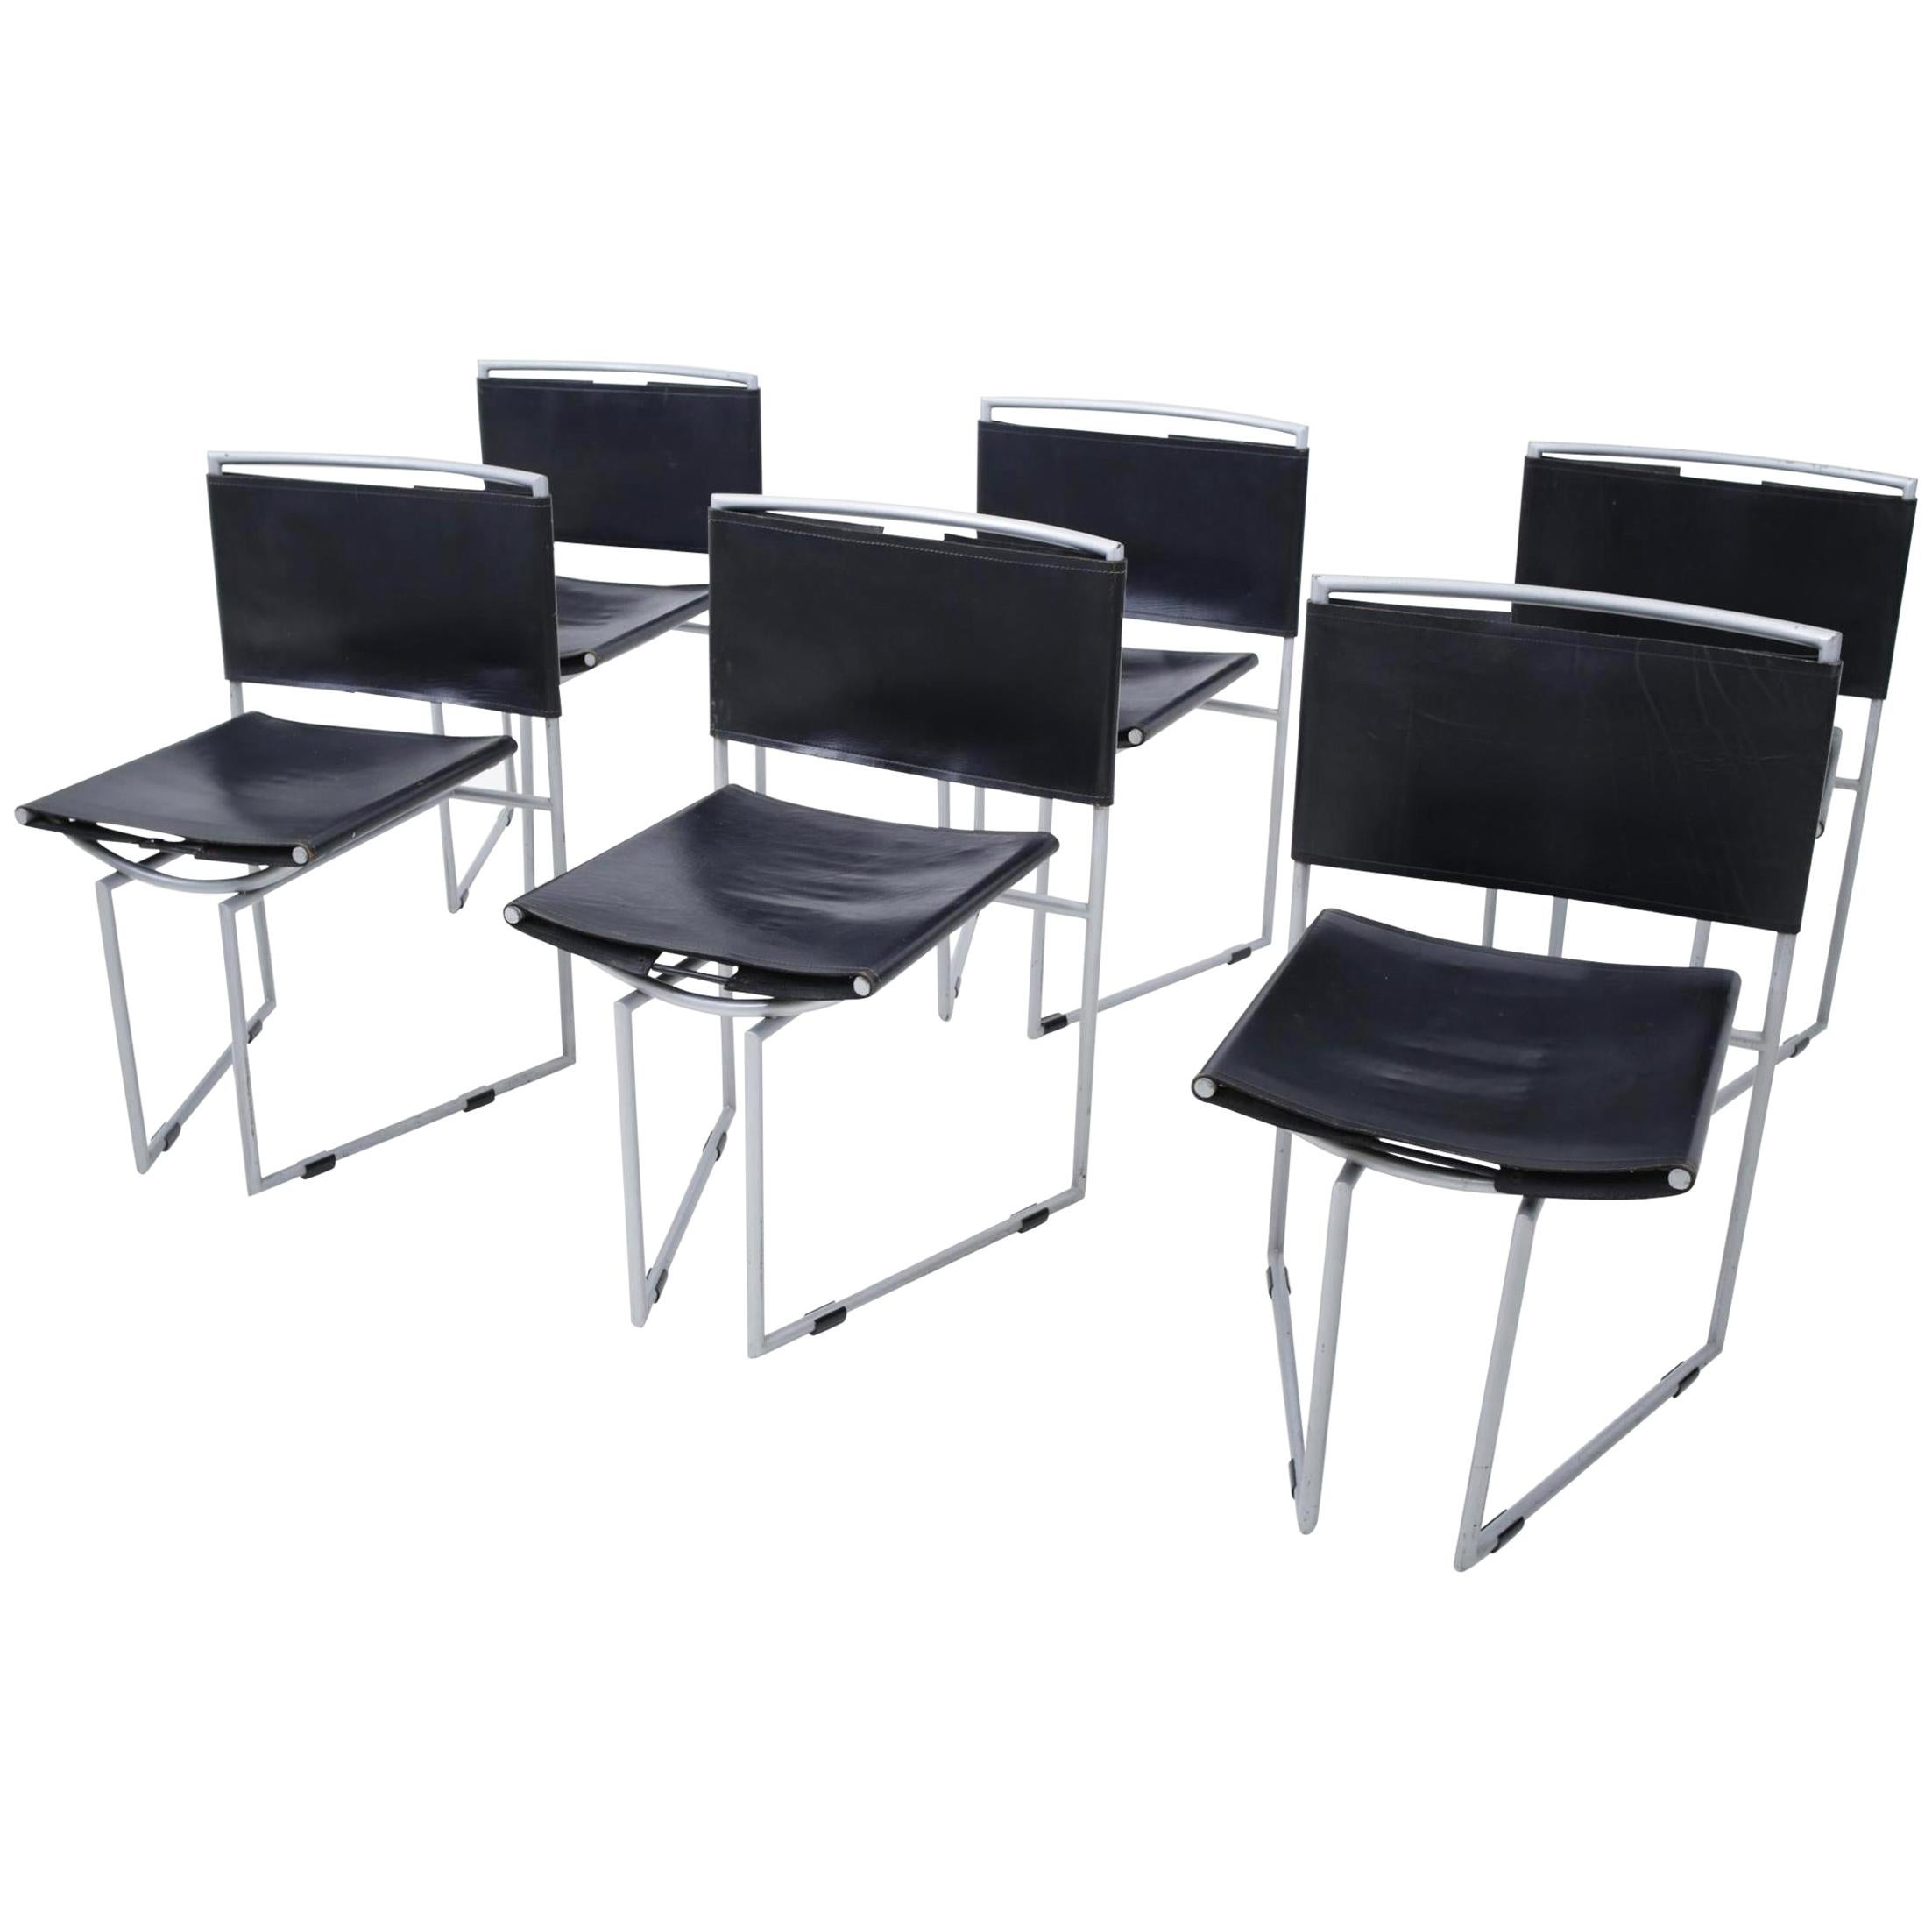 Botta 91 Chairs by Mario Botta for Alias, 1991